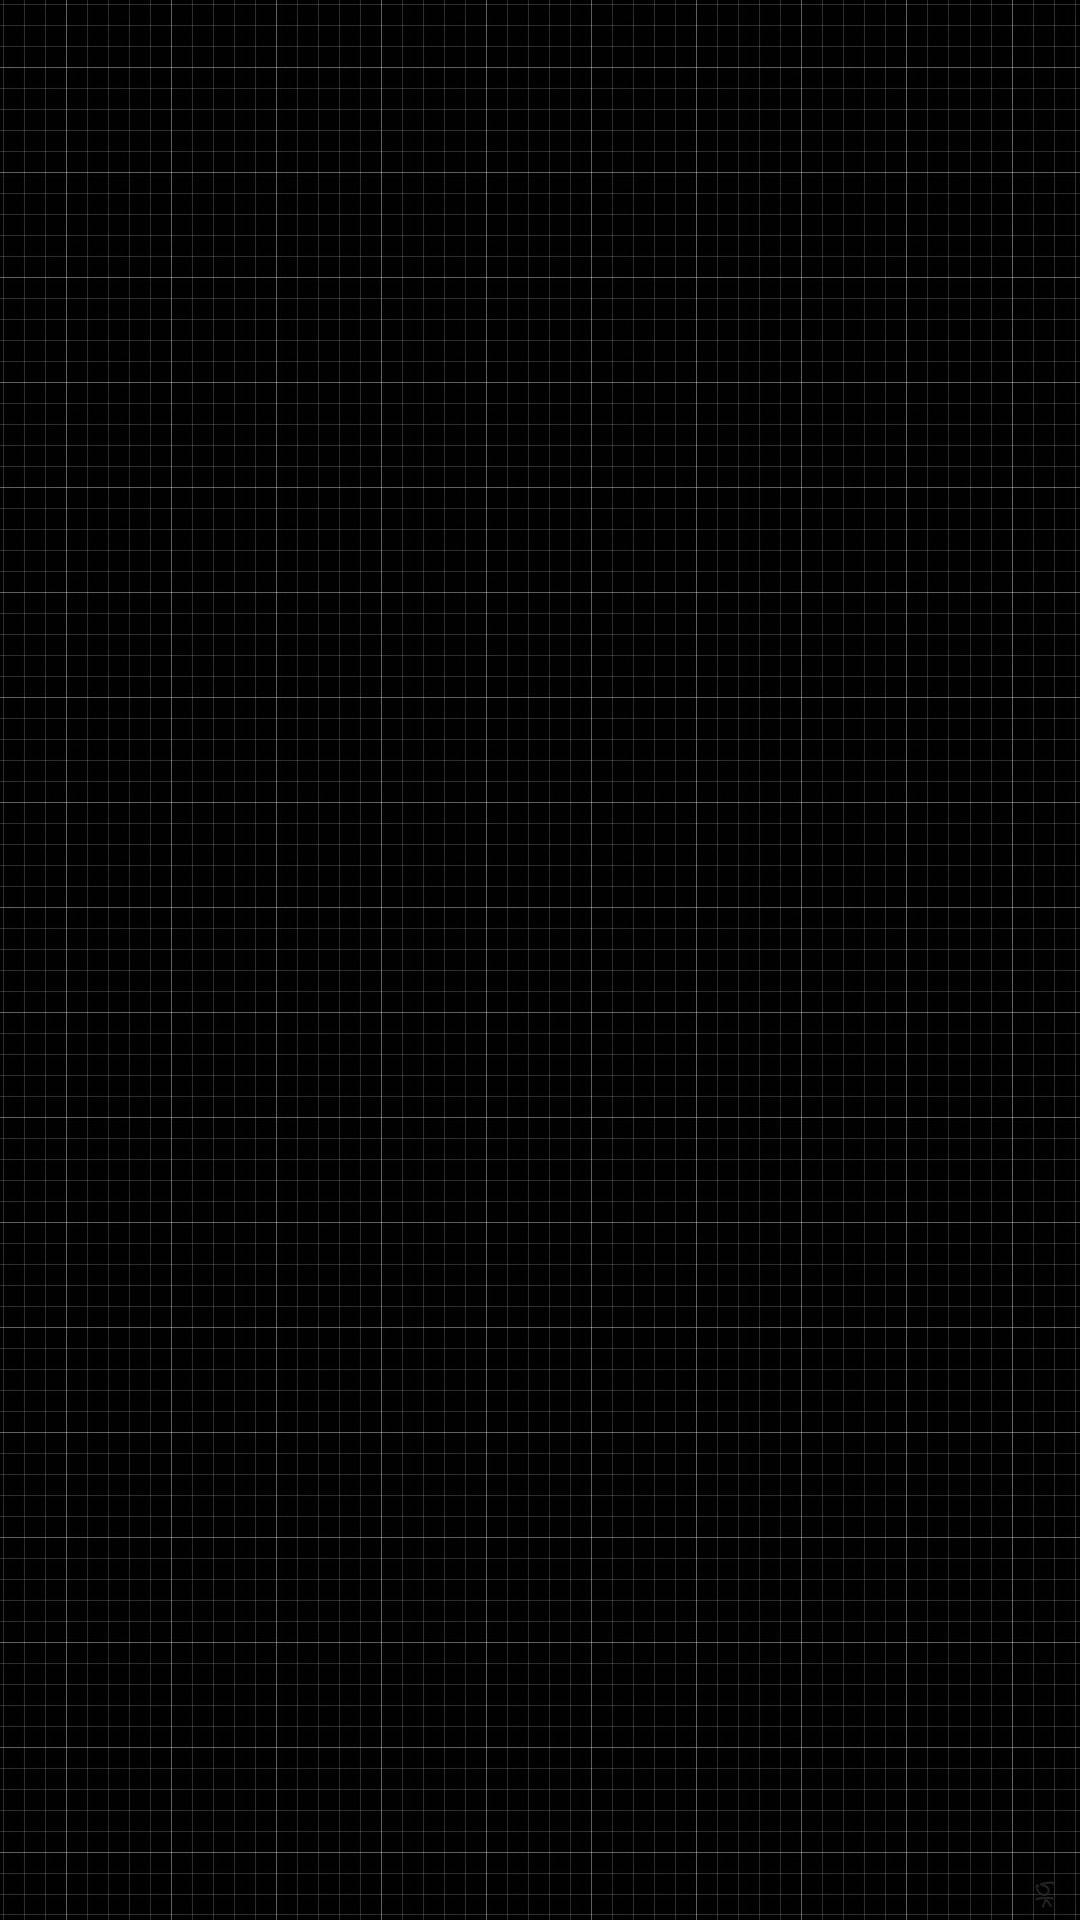 Black Iphone 6 Plus Wallpapers Top Free Black Iphone 6 Plus